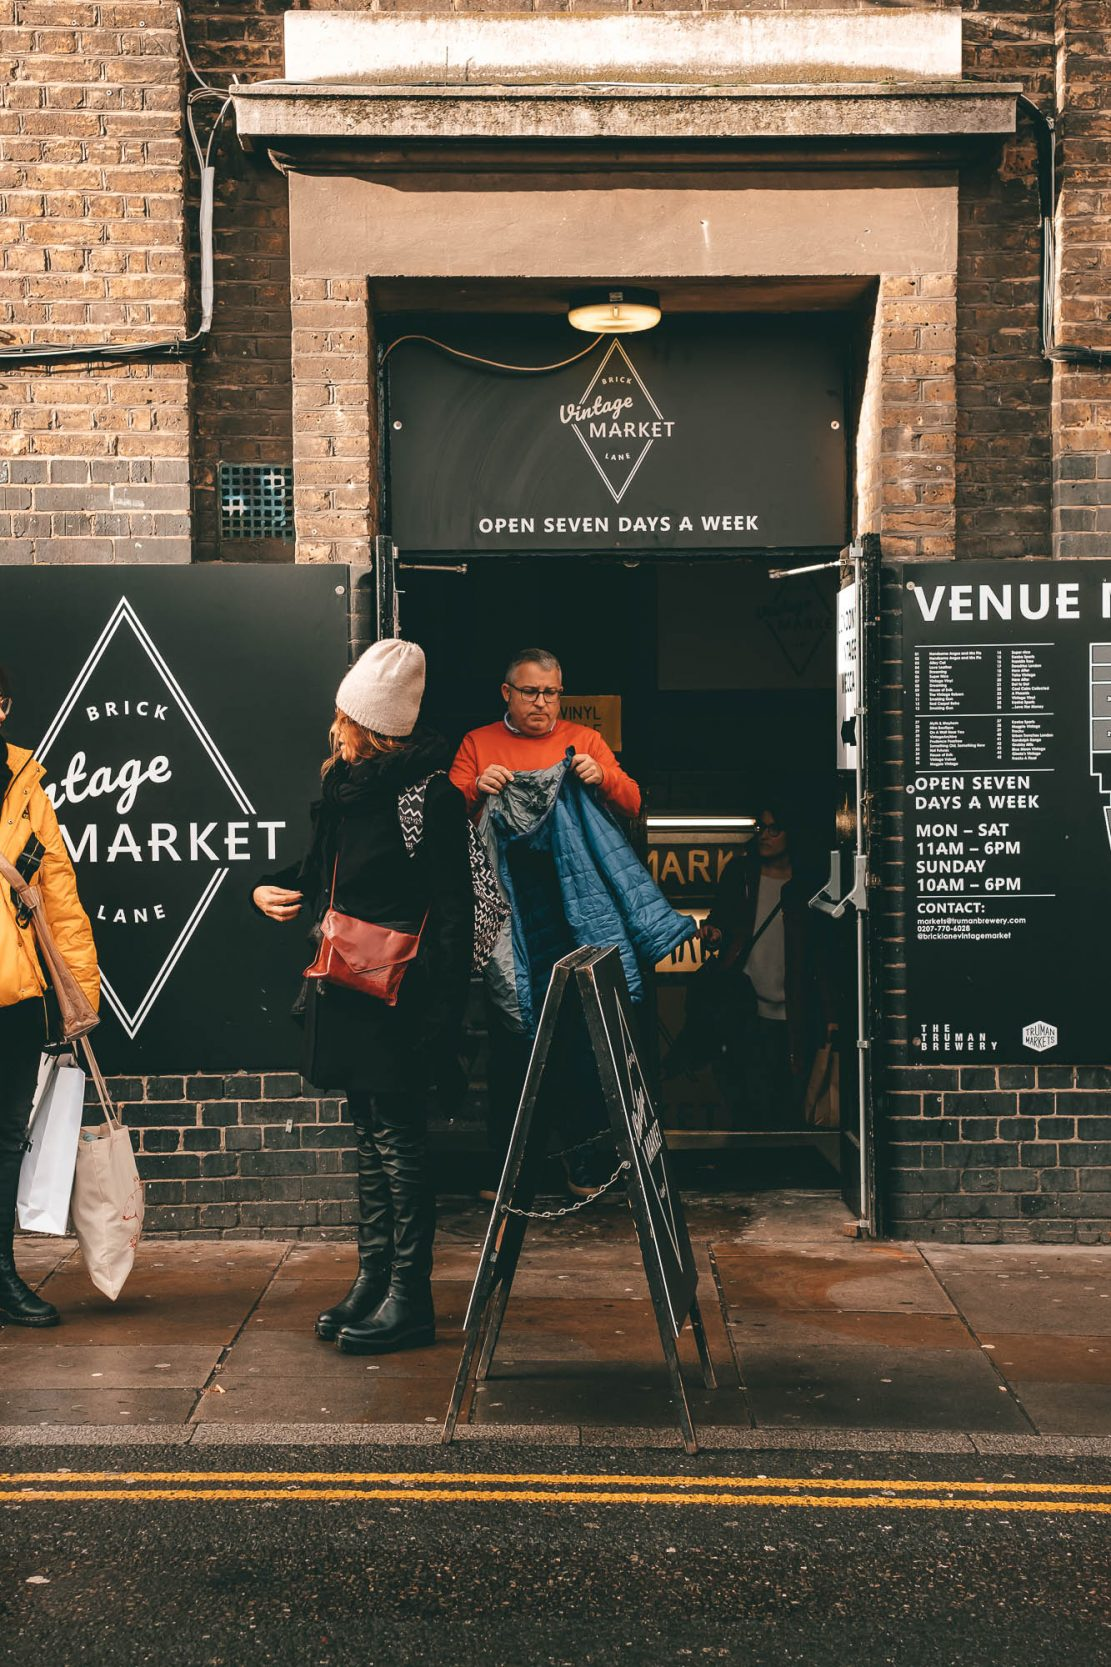 Brick Lane Vintage Market and Vintage Shops Things to do in Brick Lane London